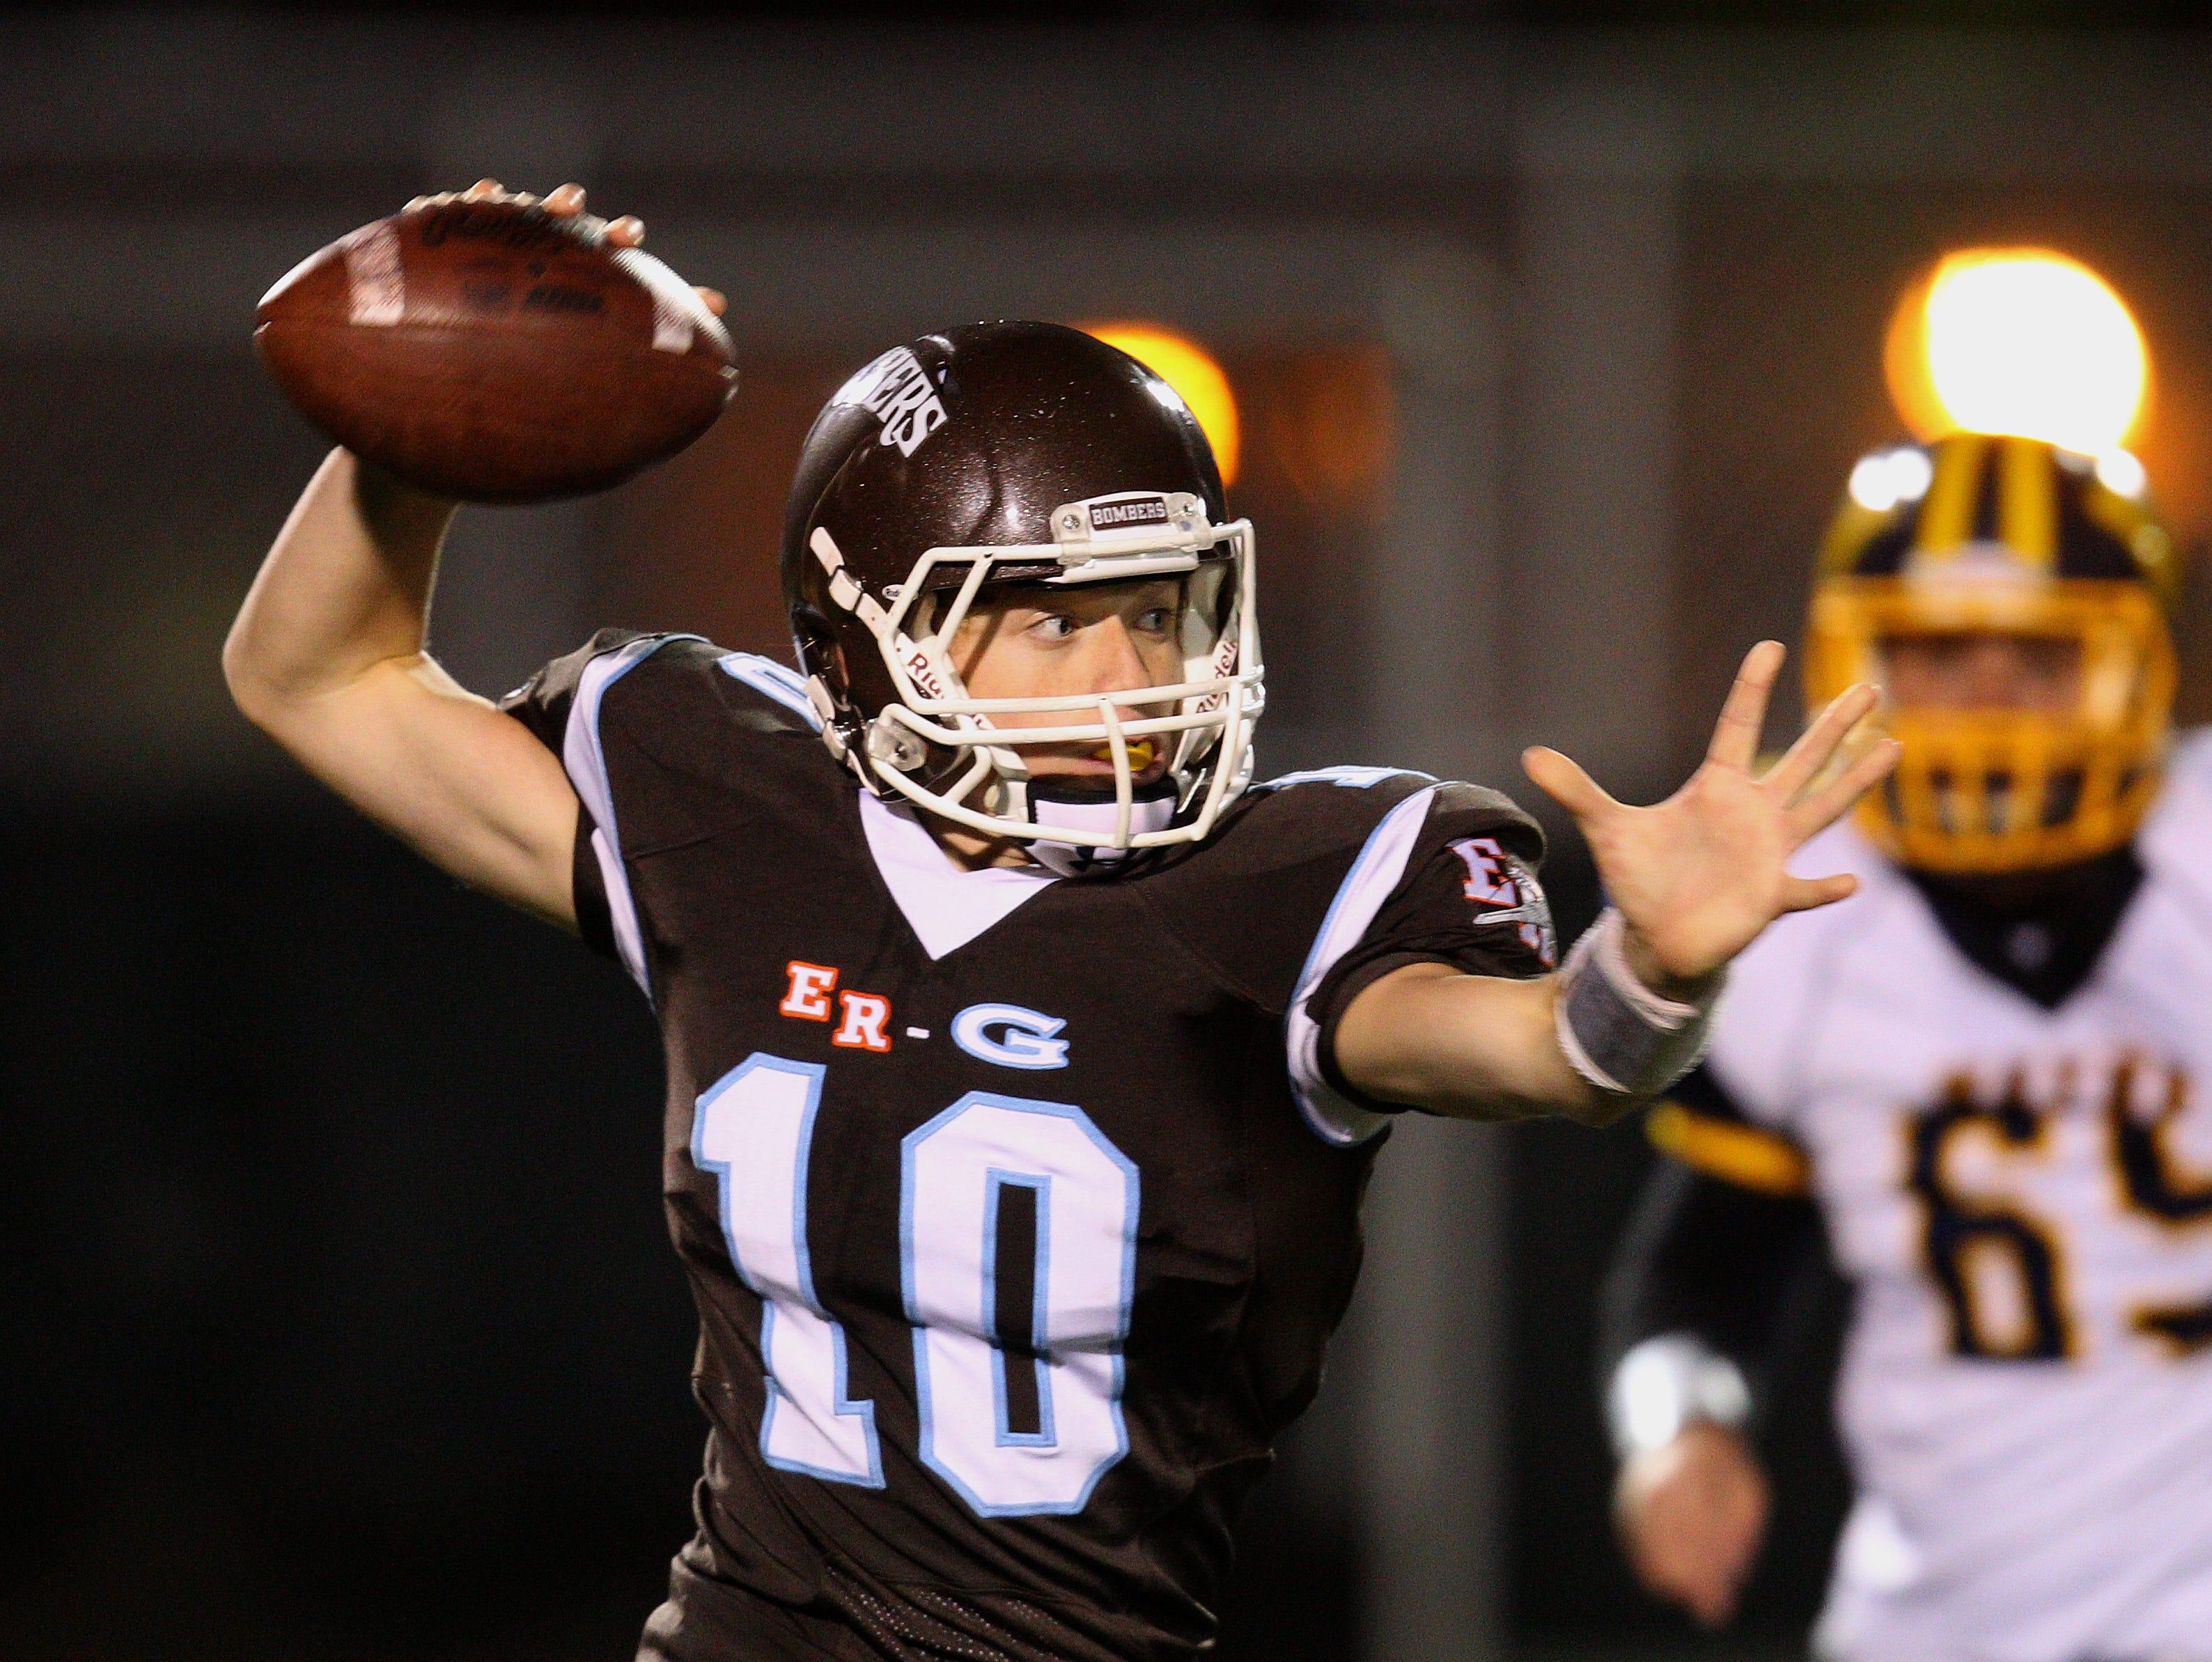 East Rochester/Gananda quarterback Patrick Shanley. 2014 file photo.